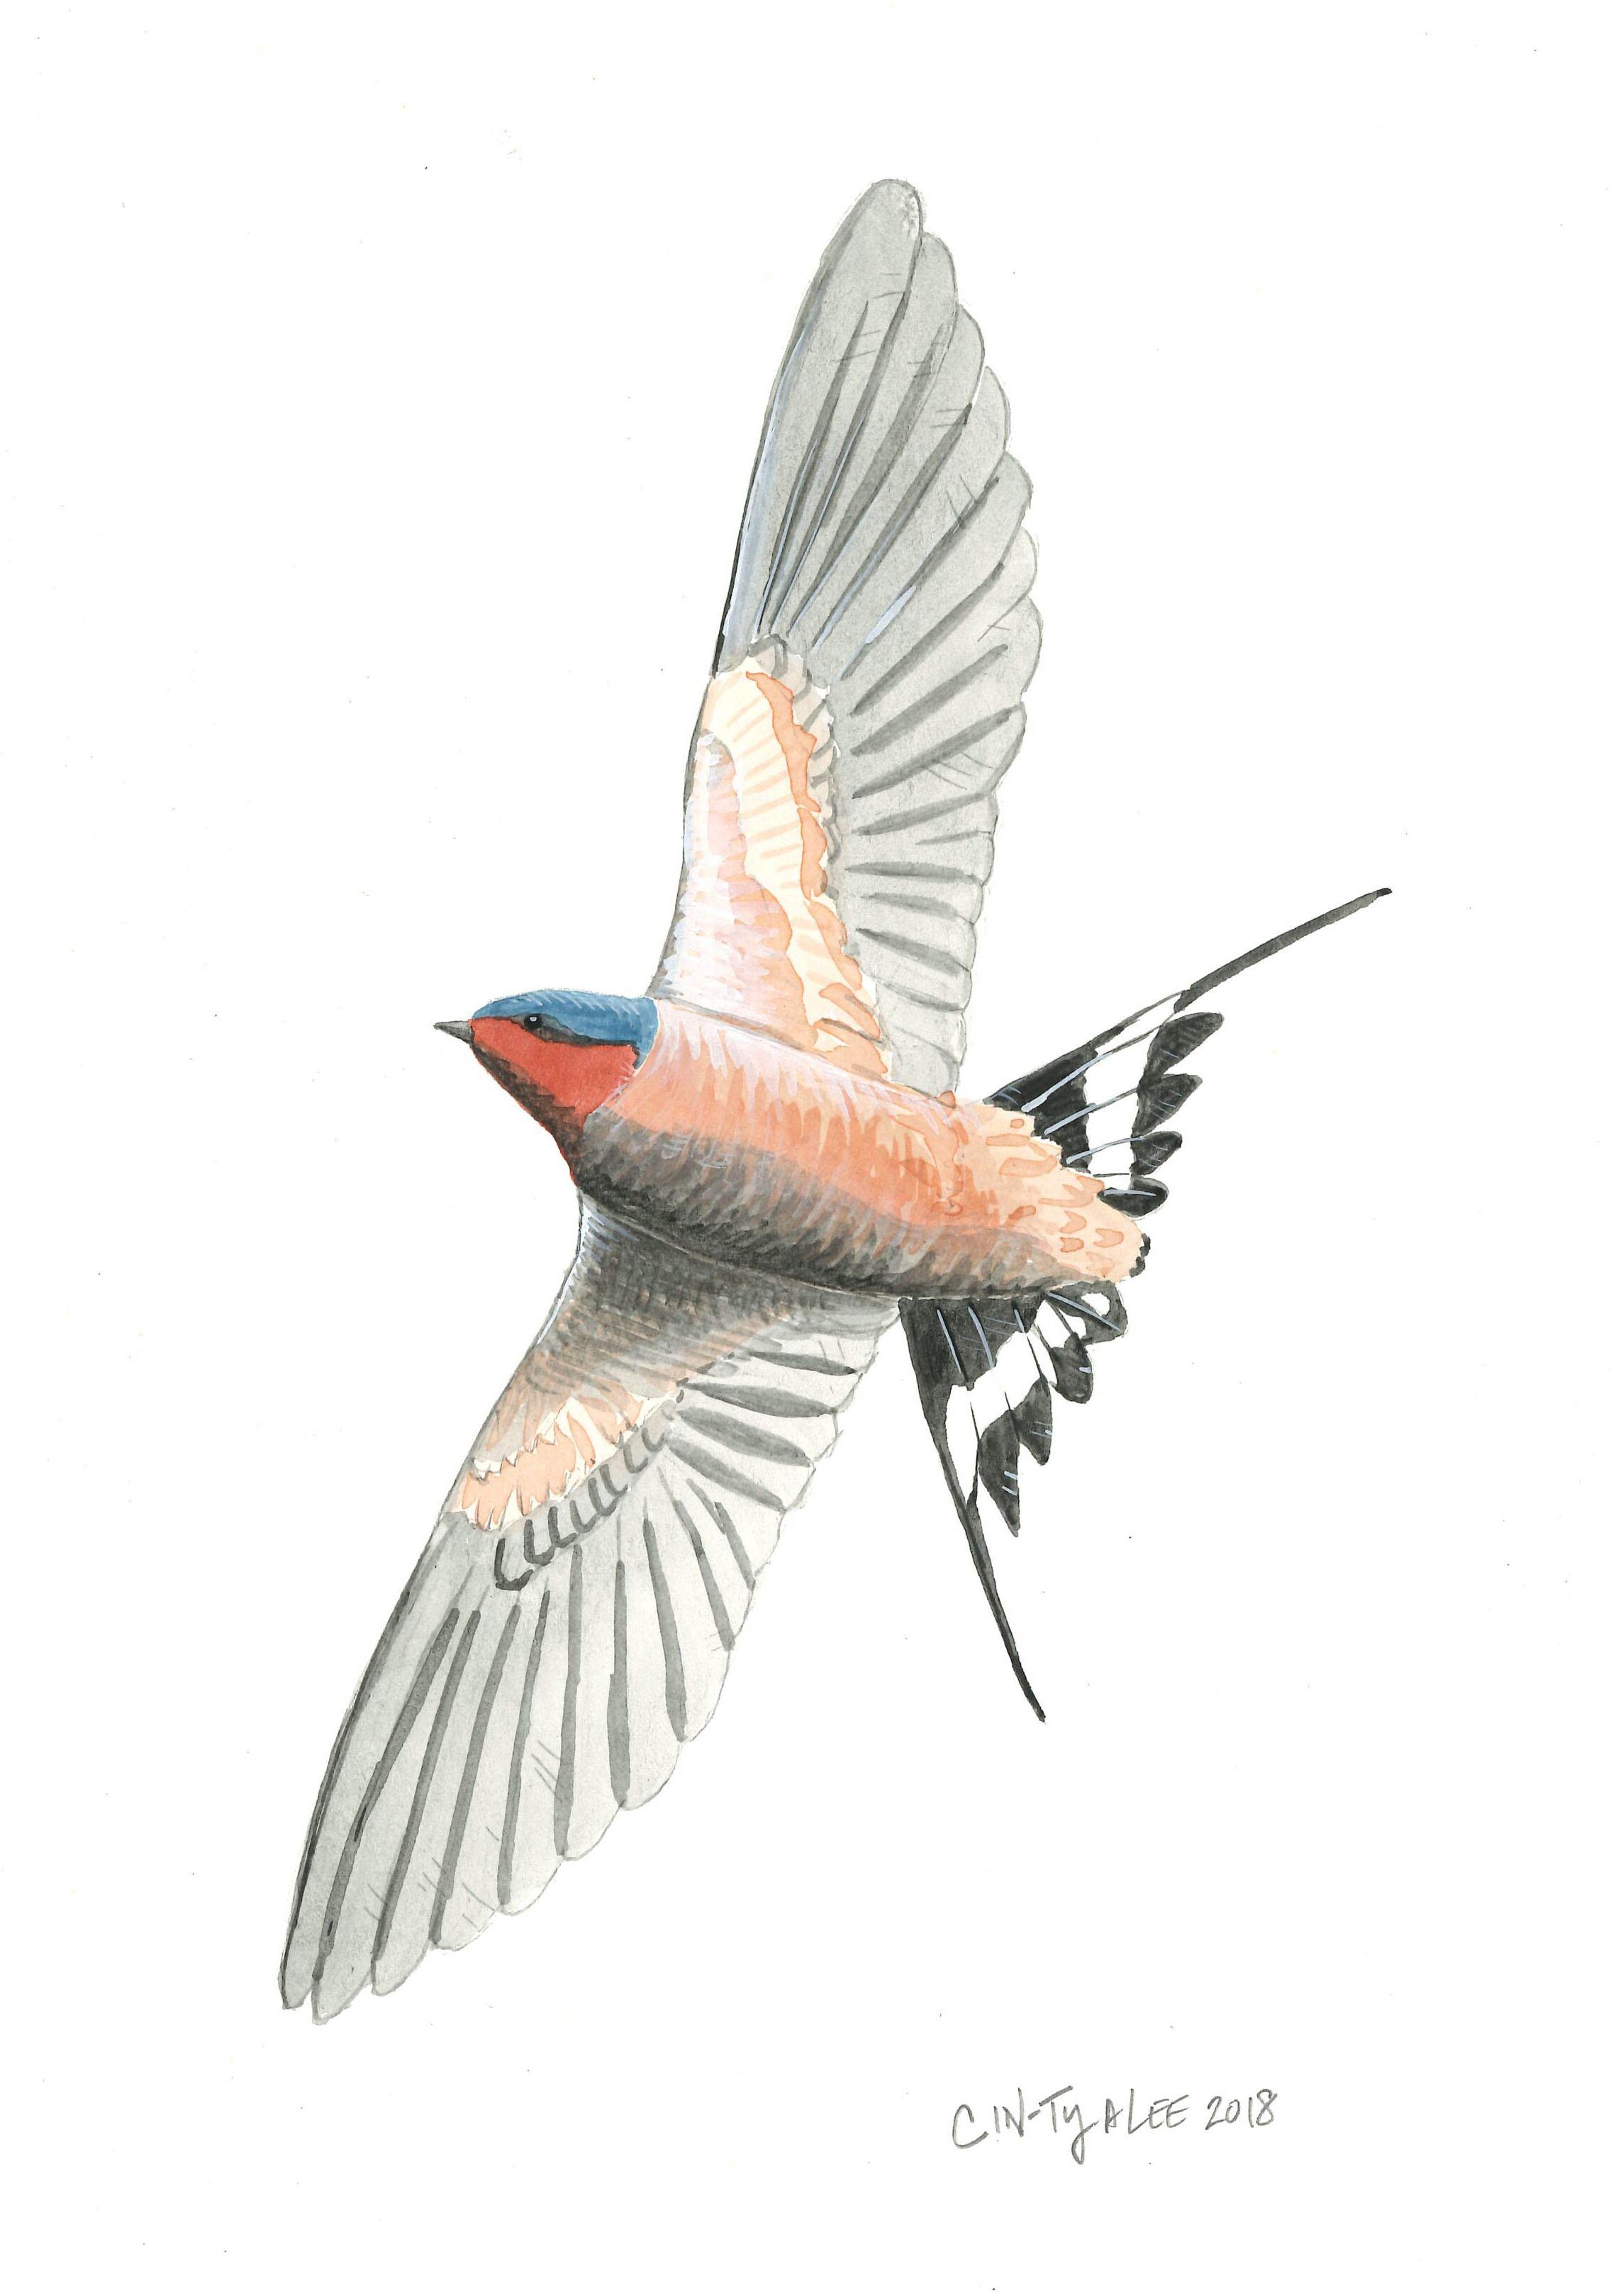 BarnSwallow2018.jpg